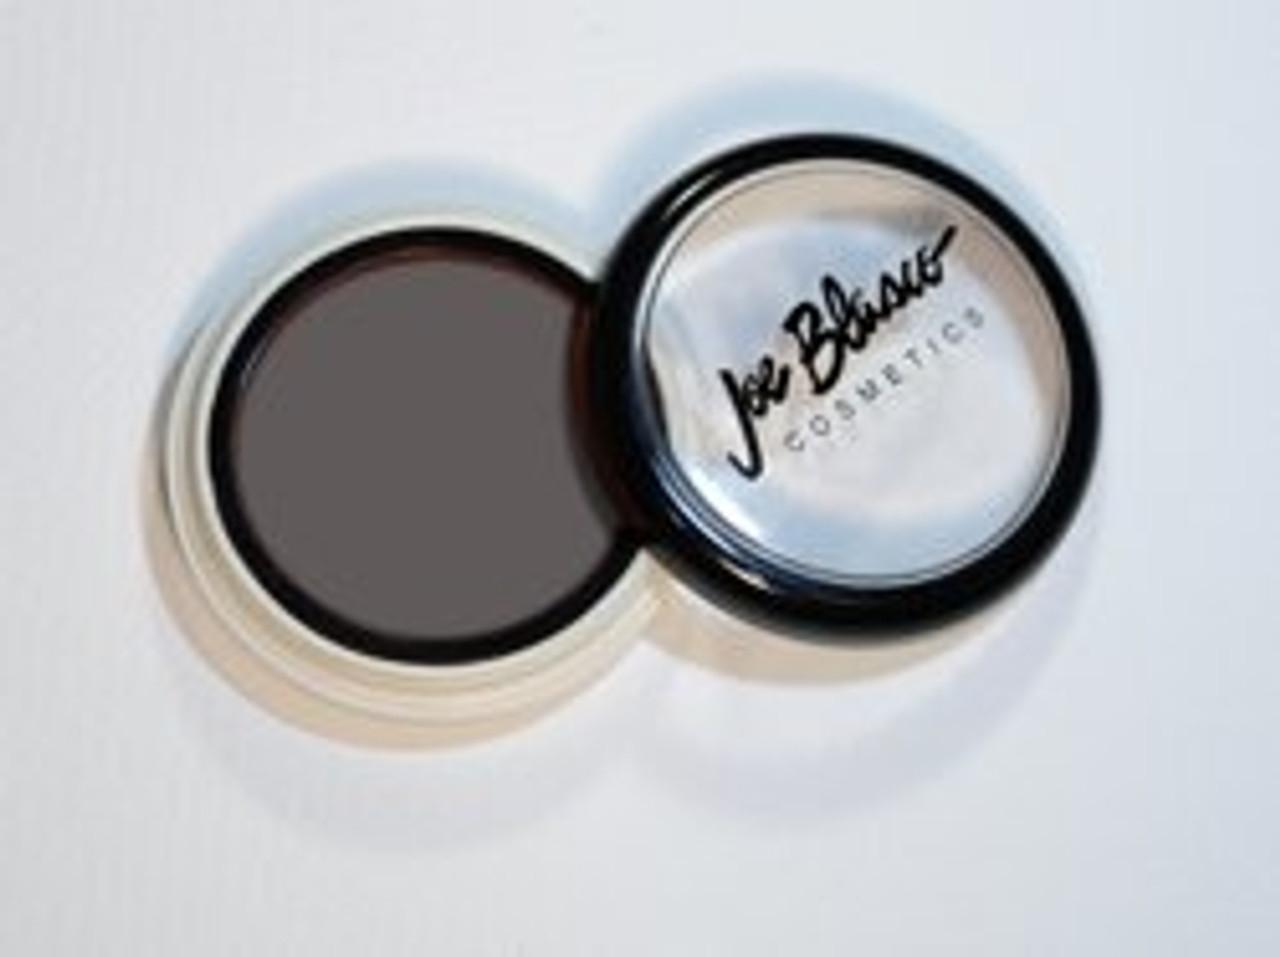 Joe Blasco Eye Shadow Ultamatte - Black